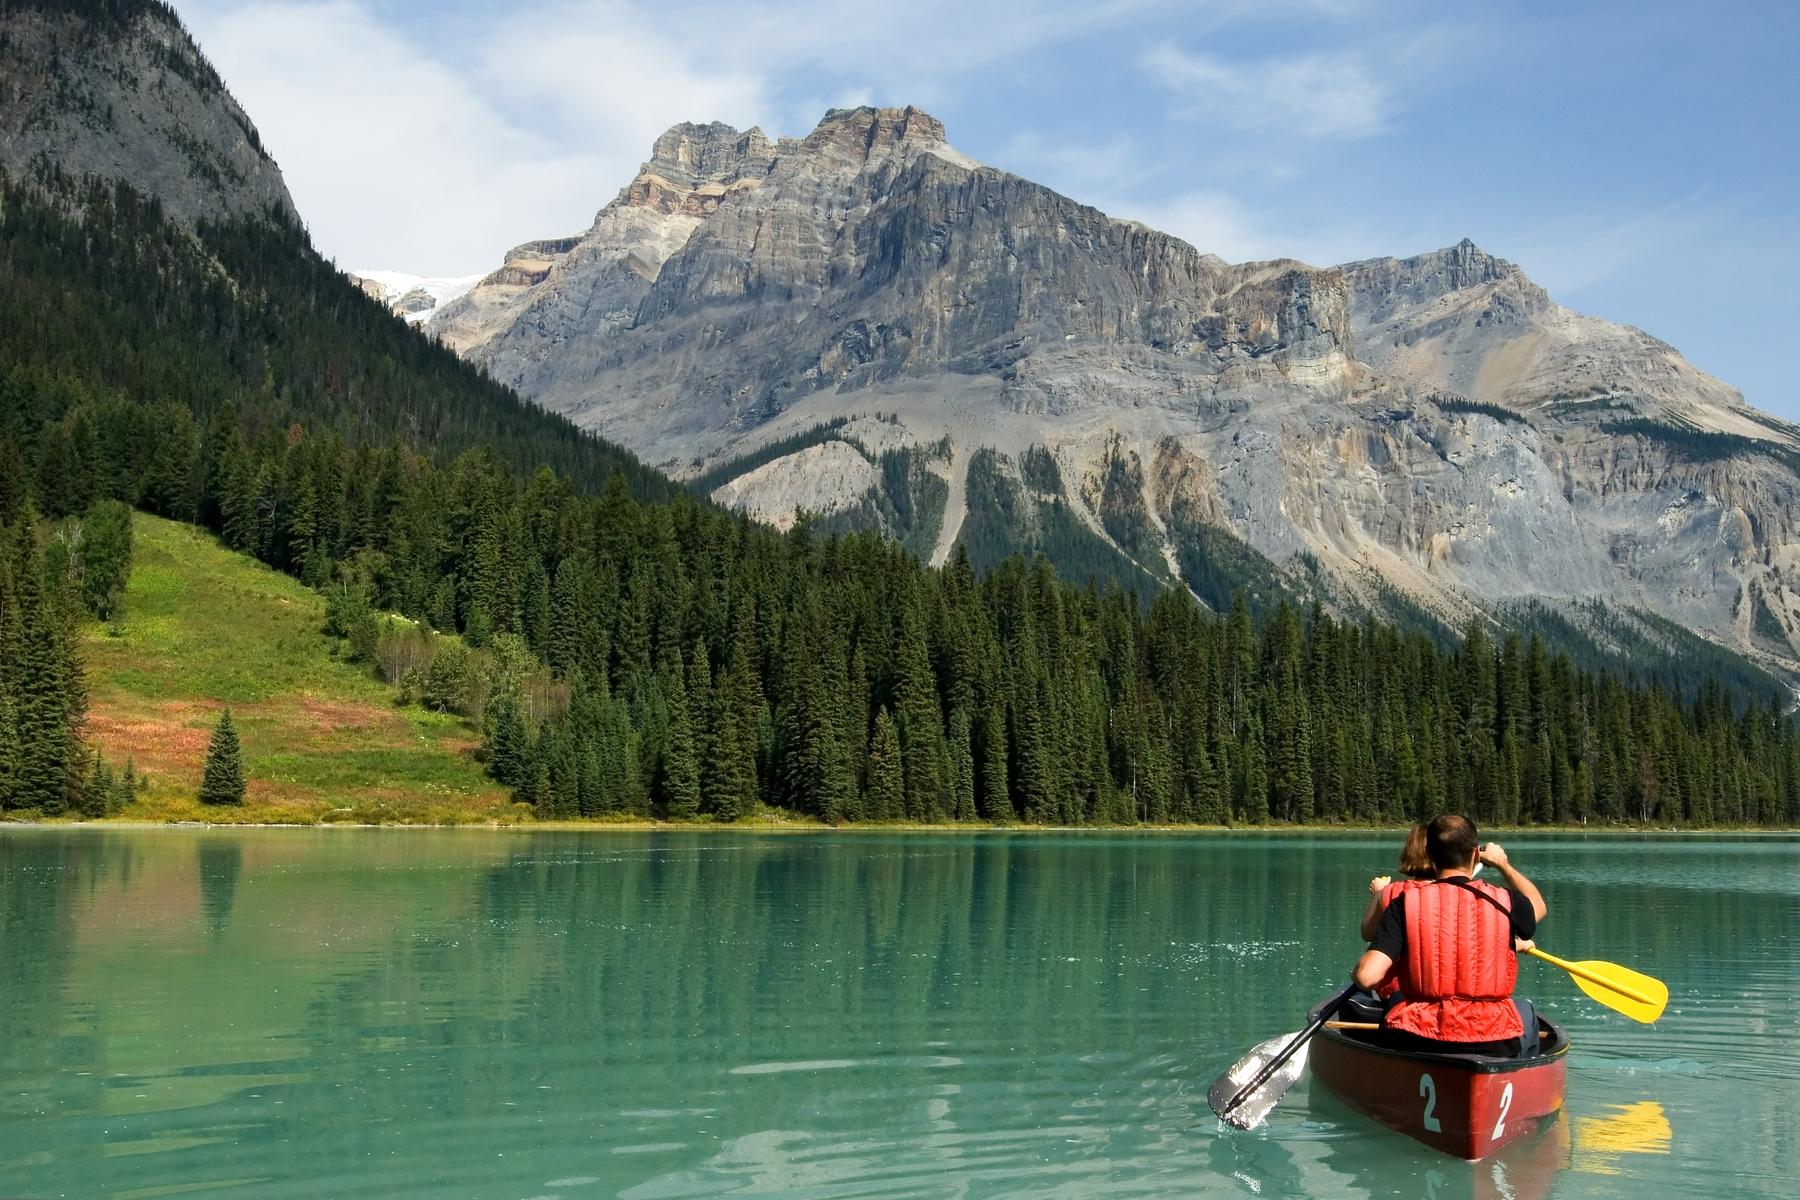 Wildnisreisen: Kanu-Abenteuer in Kanada